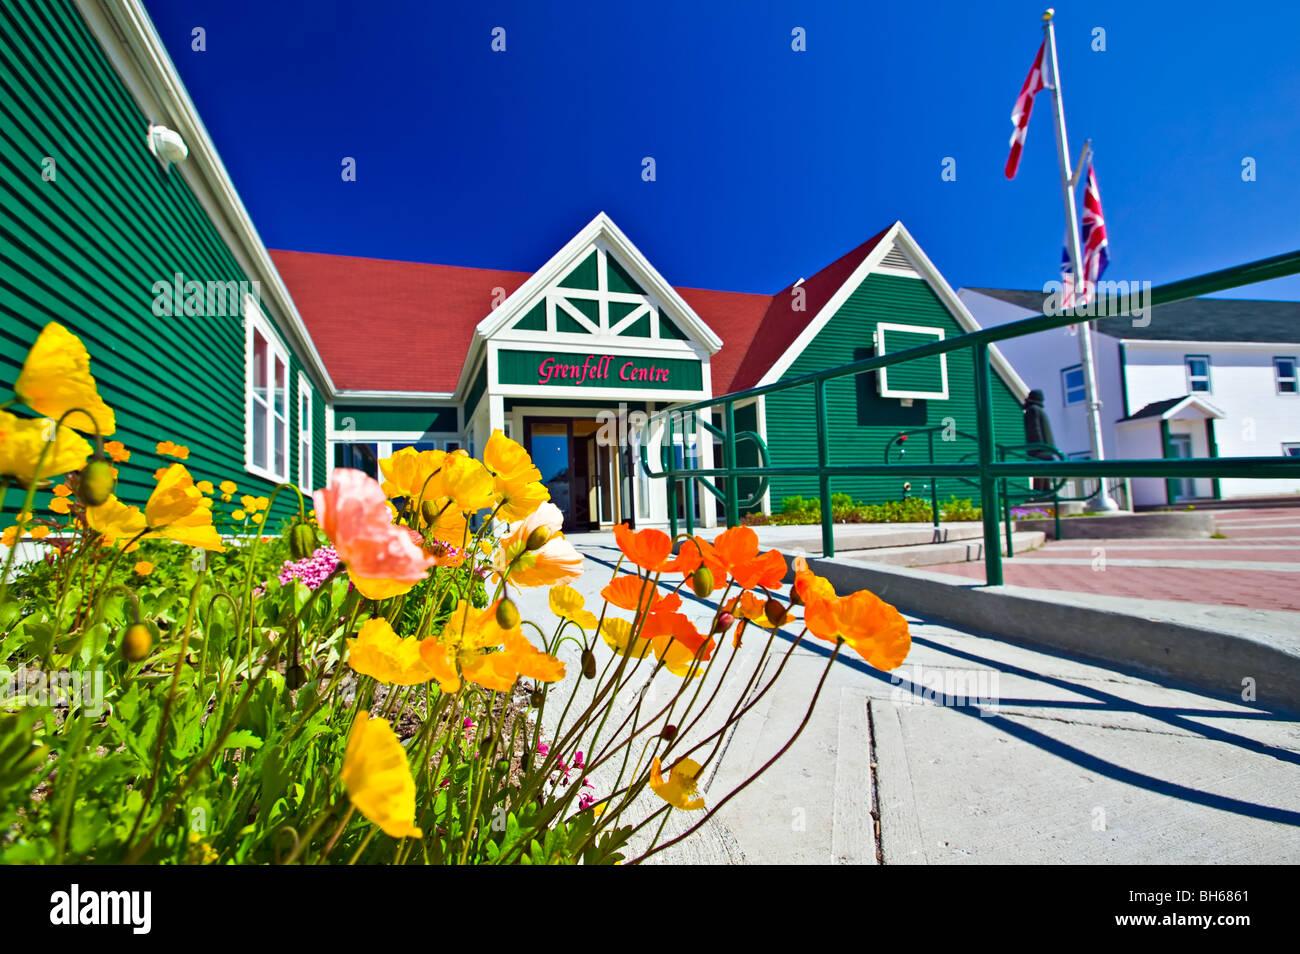 Grenfell Historic Properties, Grenfell Interpretation Center, St. Anthony, Newfoundland, Canada - Stock Image